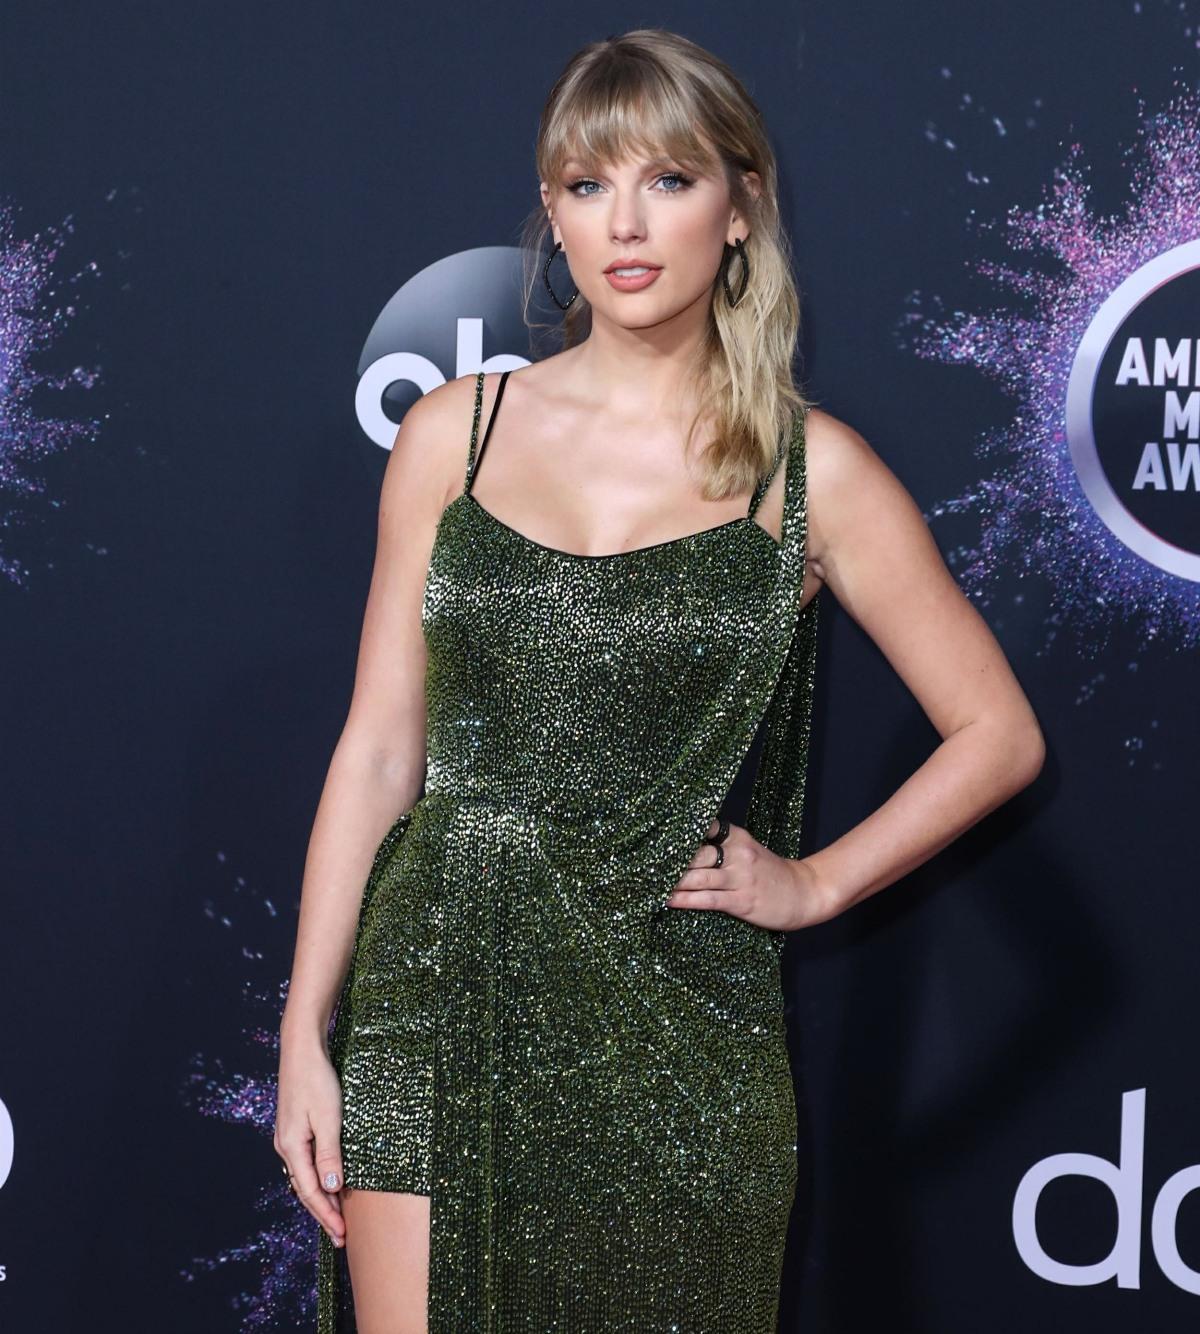 Taylor Swift arrives at the 2019 American Music Awards wearing a Julien Macdonald dress